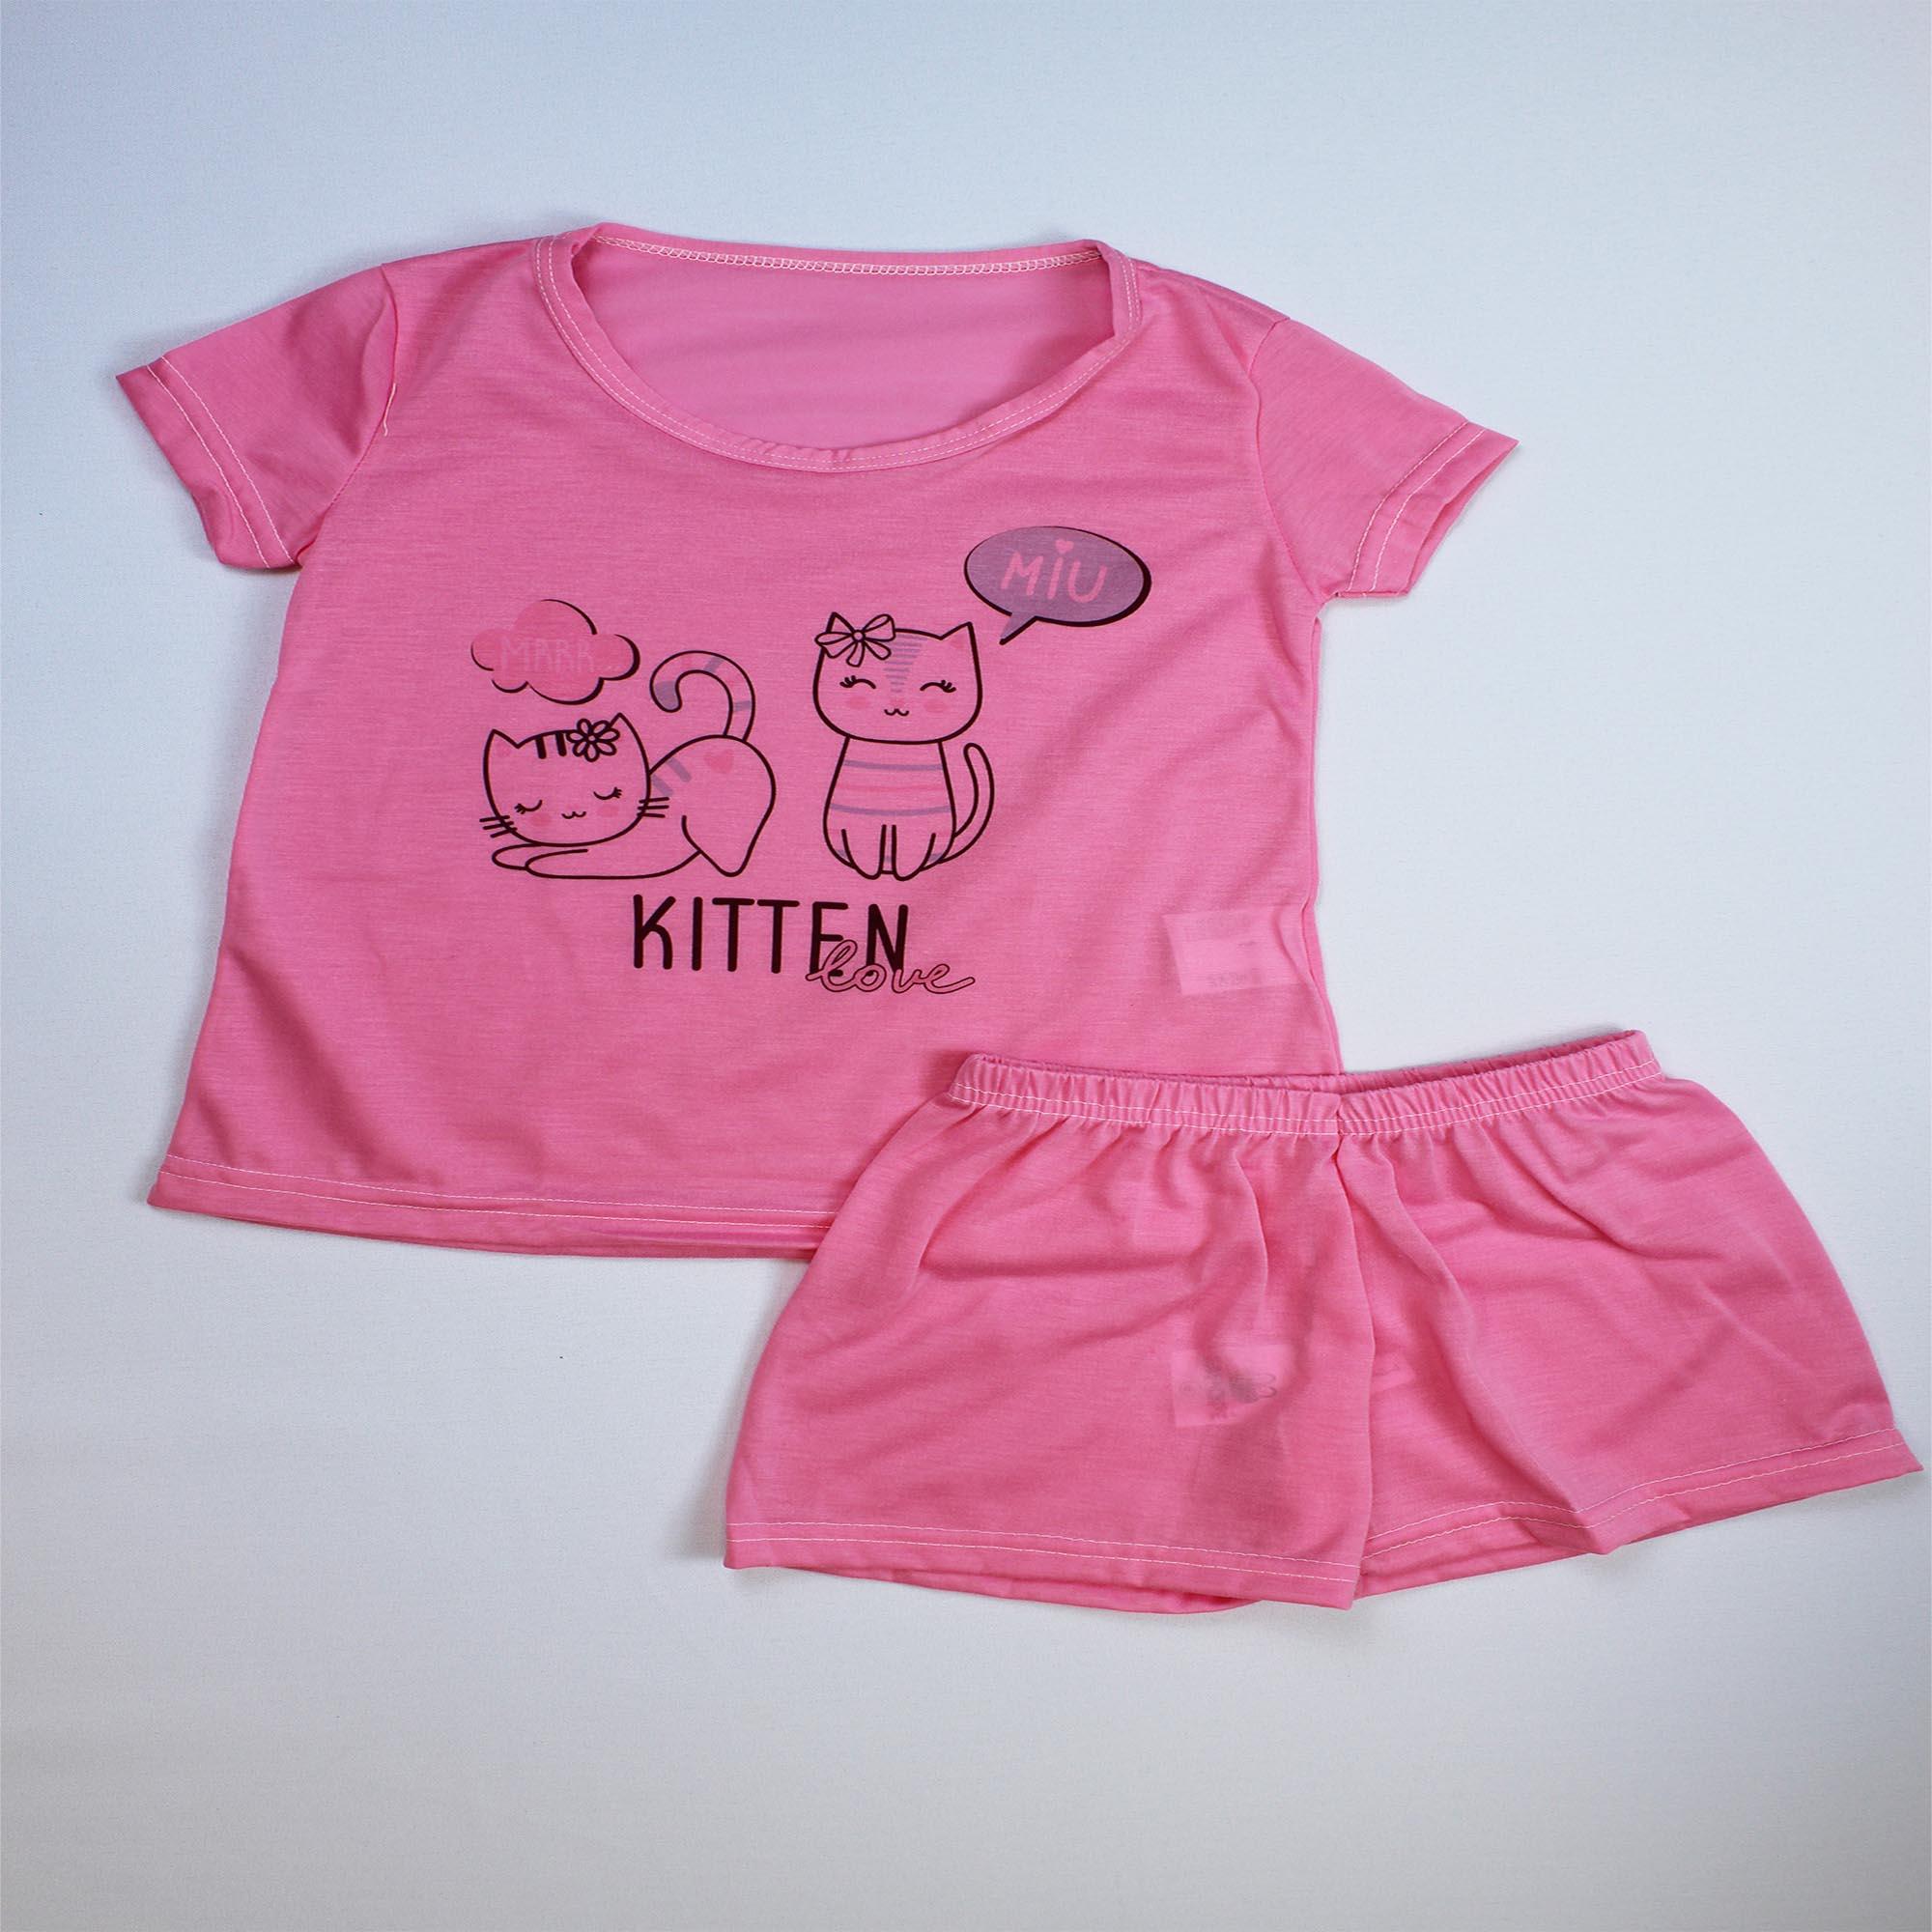 Pijama Infantil Menina - Tamanho 8